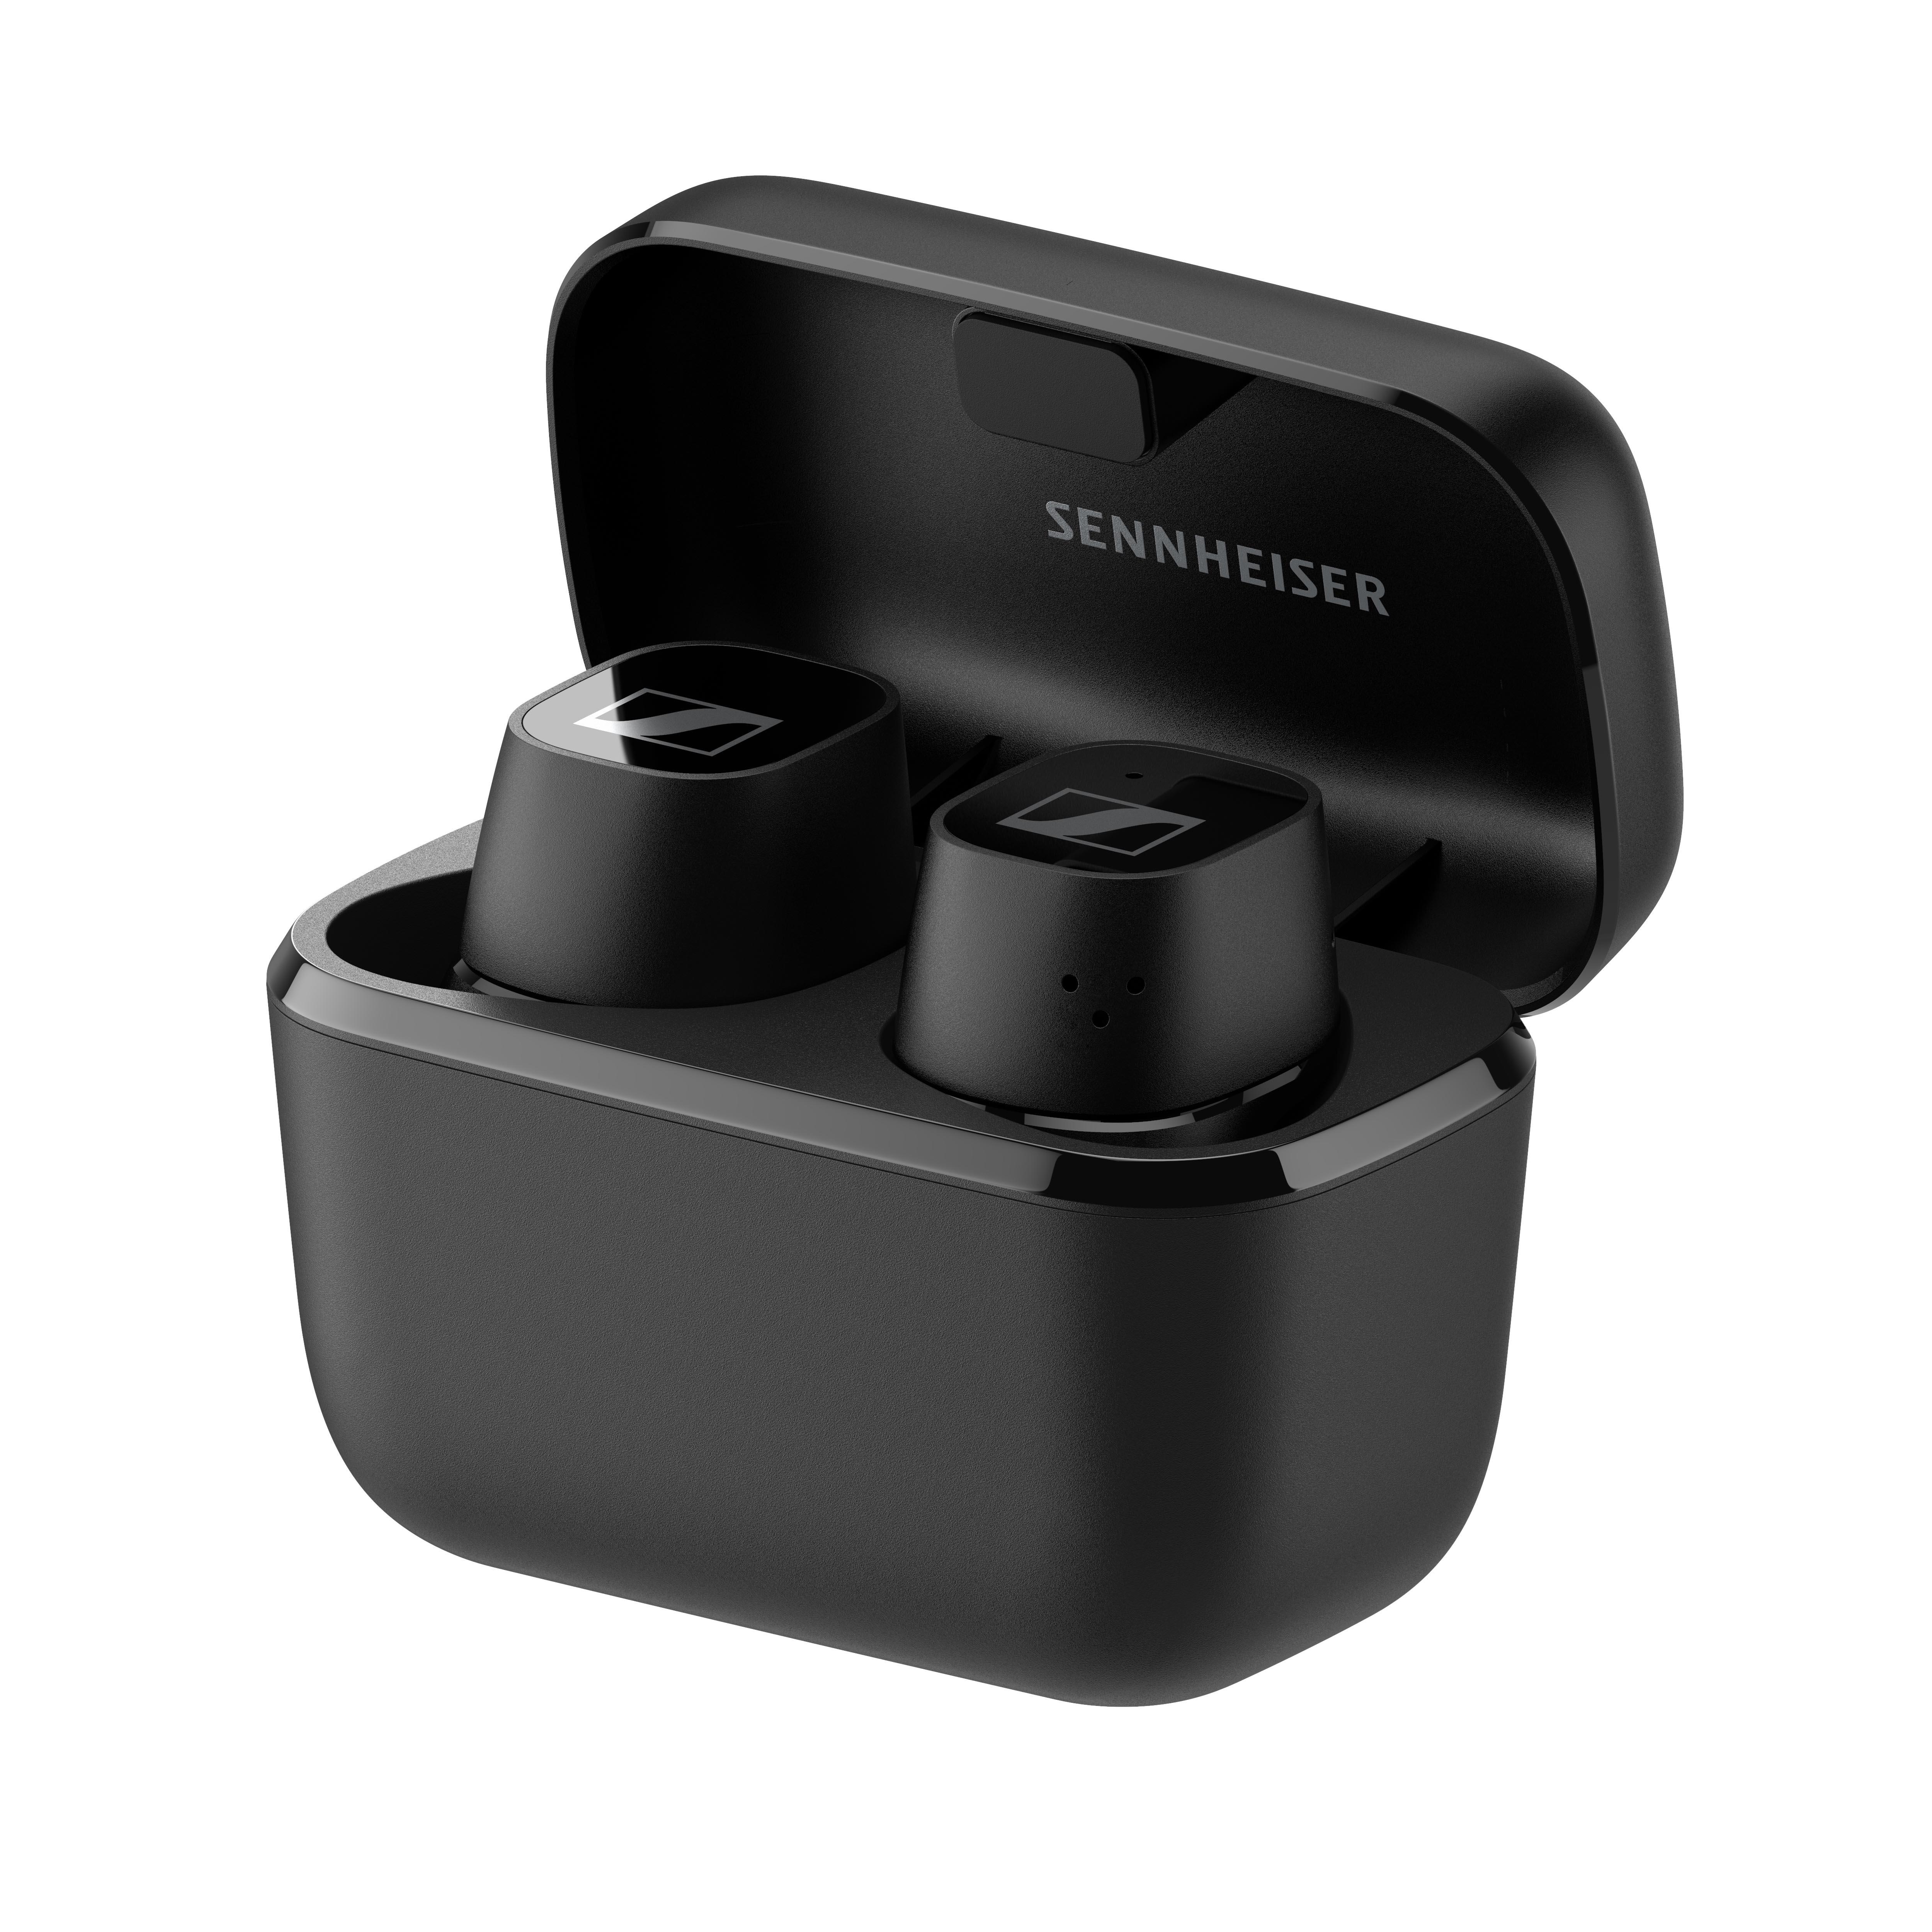 Sennheiser - CX 400 Wireless Earphones With Bluetooth - Black